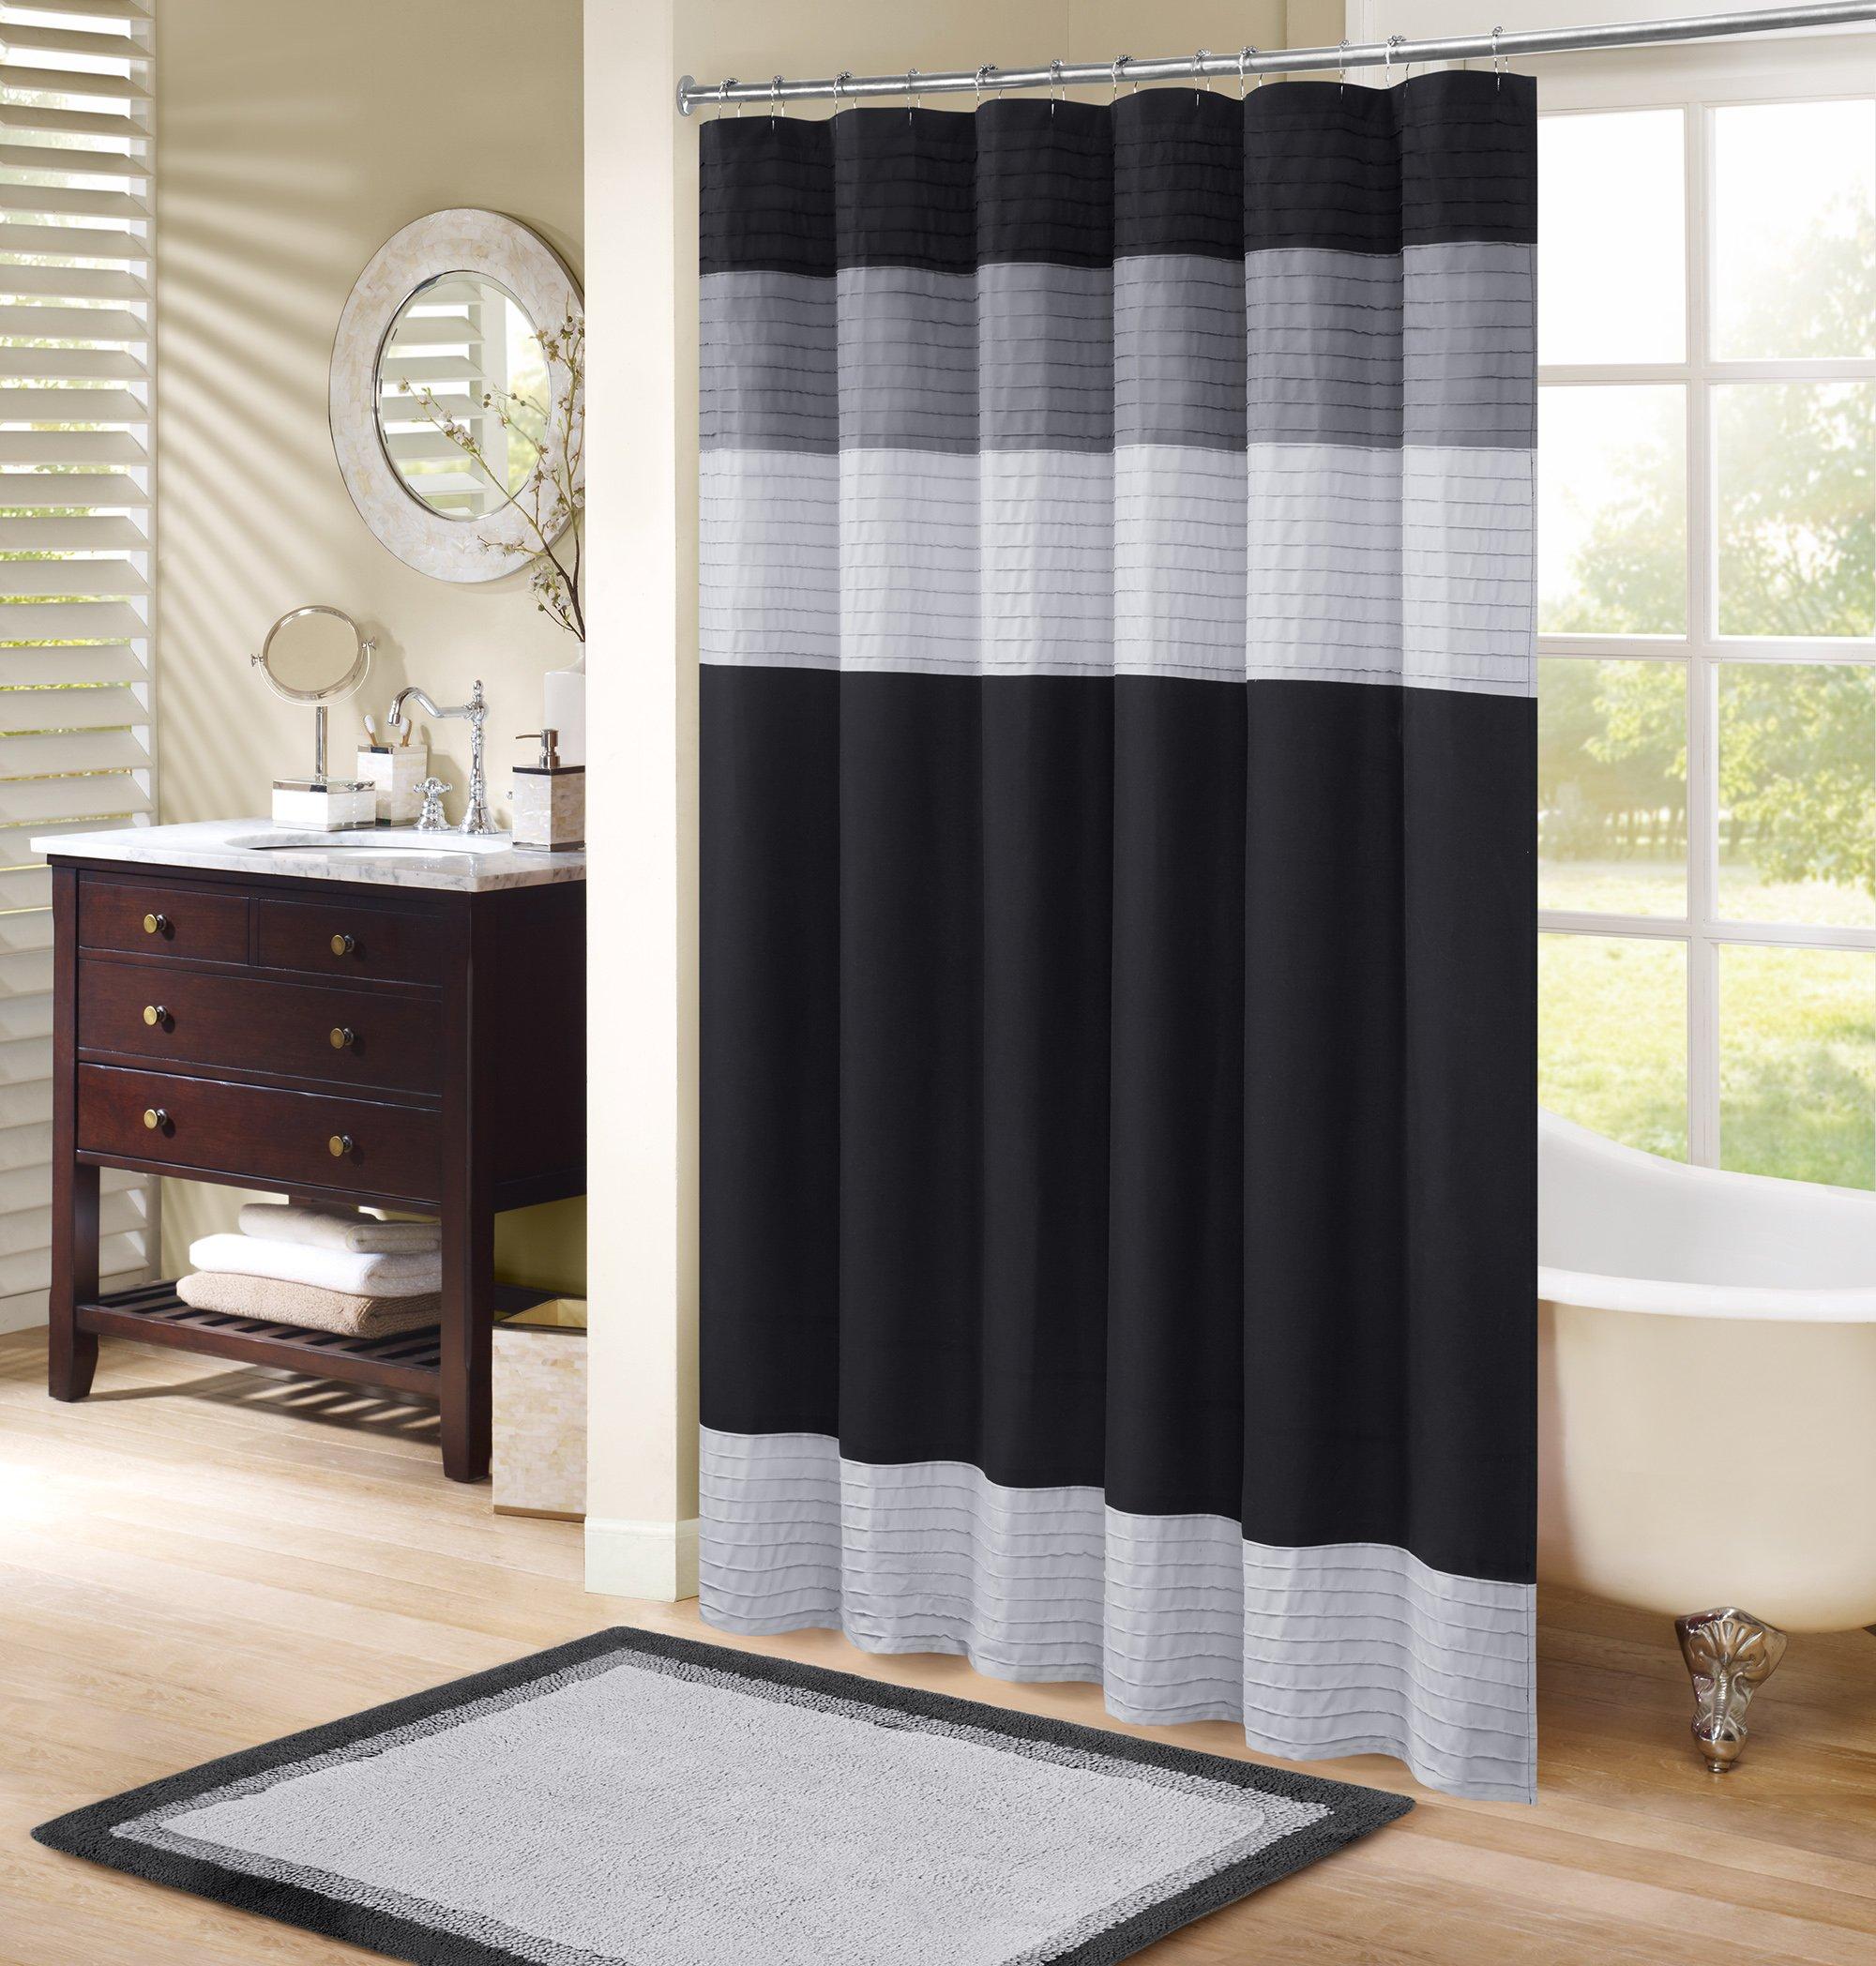 Comfort Spaces Windsor Bathroom Shower Pieced Ruffle Pattern Modern Elegant Microfiber Fabric Bath Curtains, 72''x72'', Black Grey by Comfort Spaces